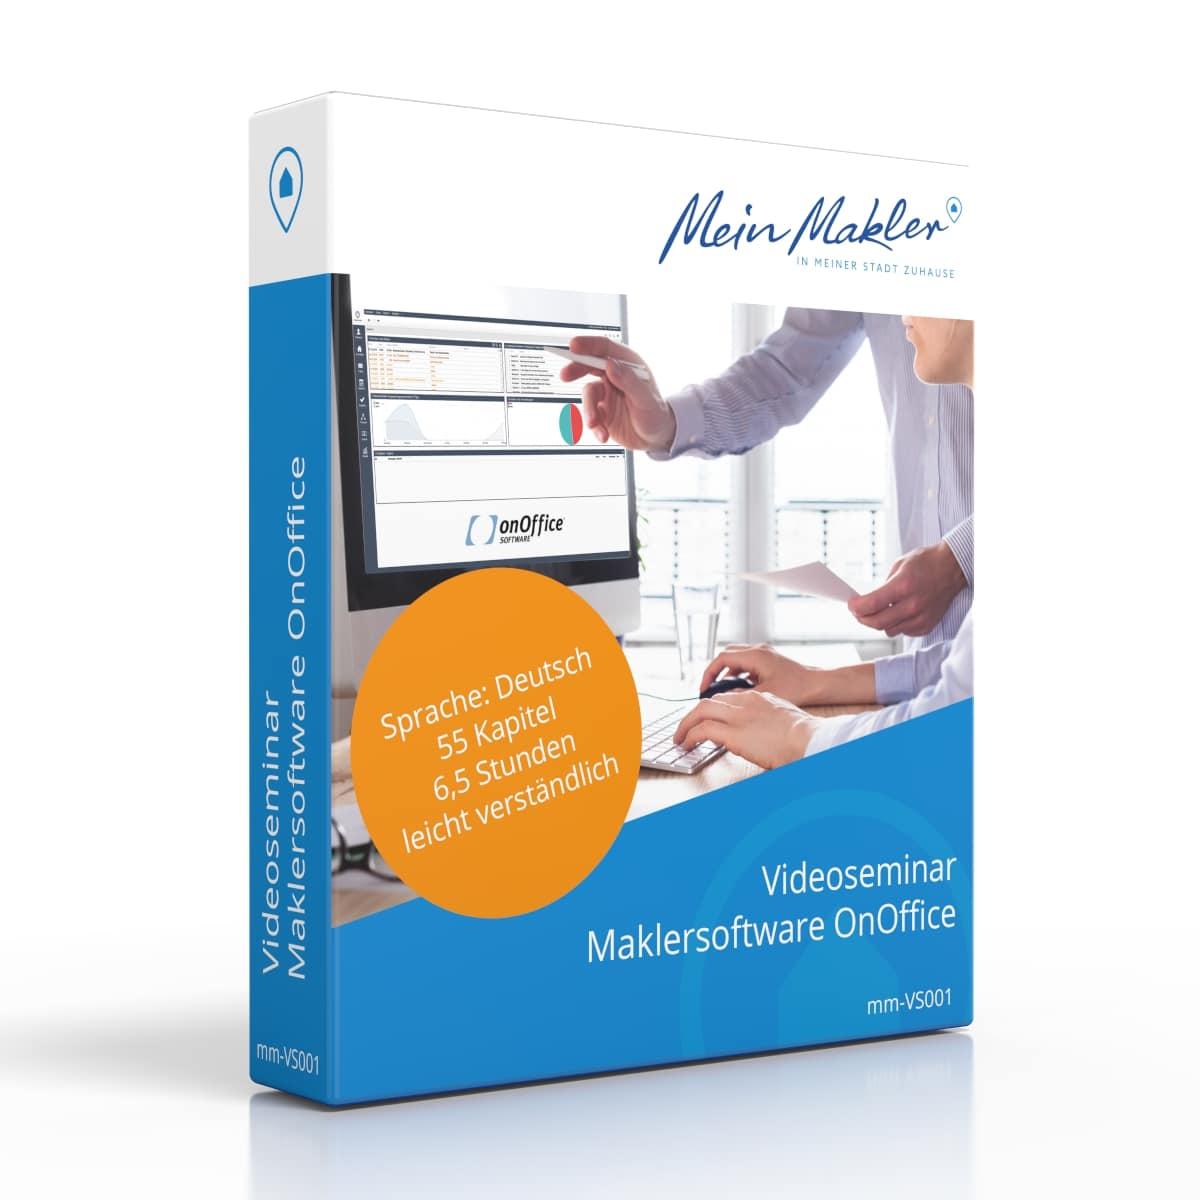 Videoseminar Maklersoftware OnOffice